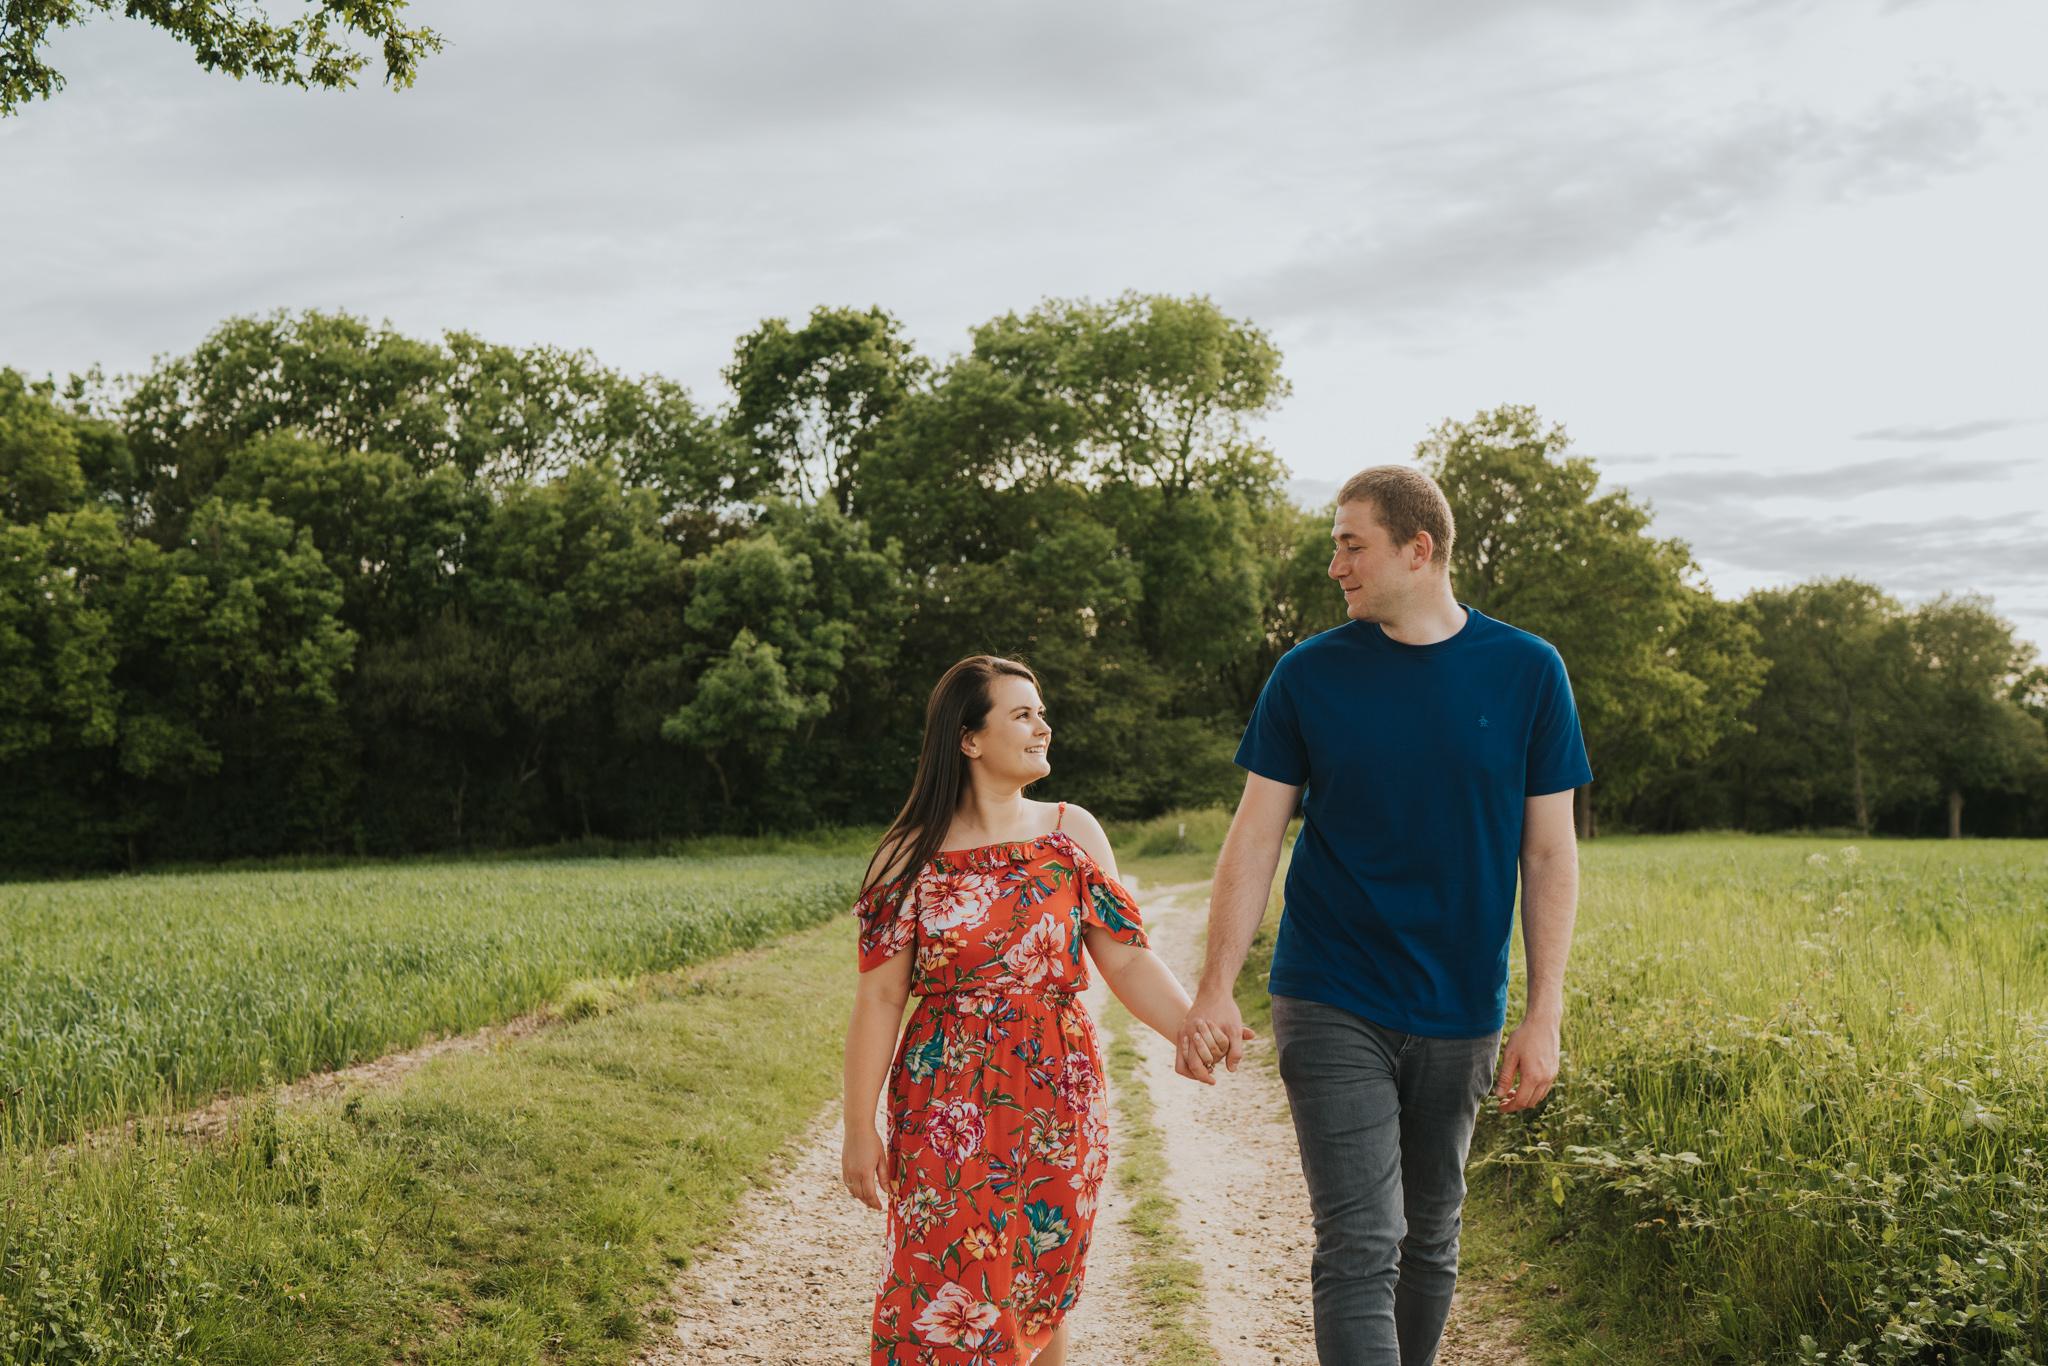 emily-dom-pre-wedding-session-west-bergholt-colchester-grace-elizabeth-colchester-essex-alternative-wedding-lifestyle-photographer-essex-suffolk-norfolk-devon (32 of 34).jpg